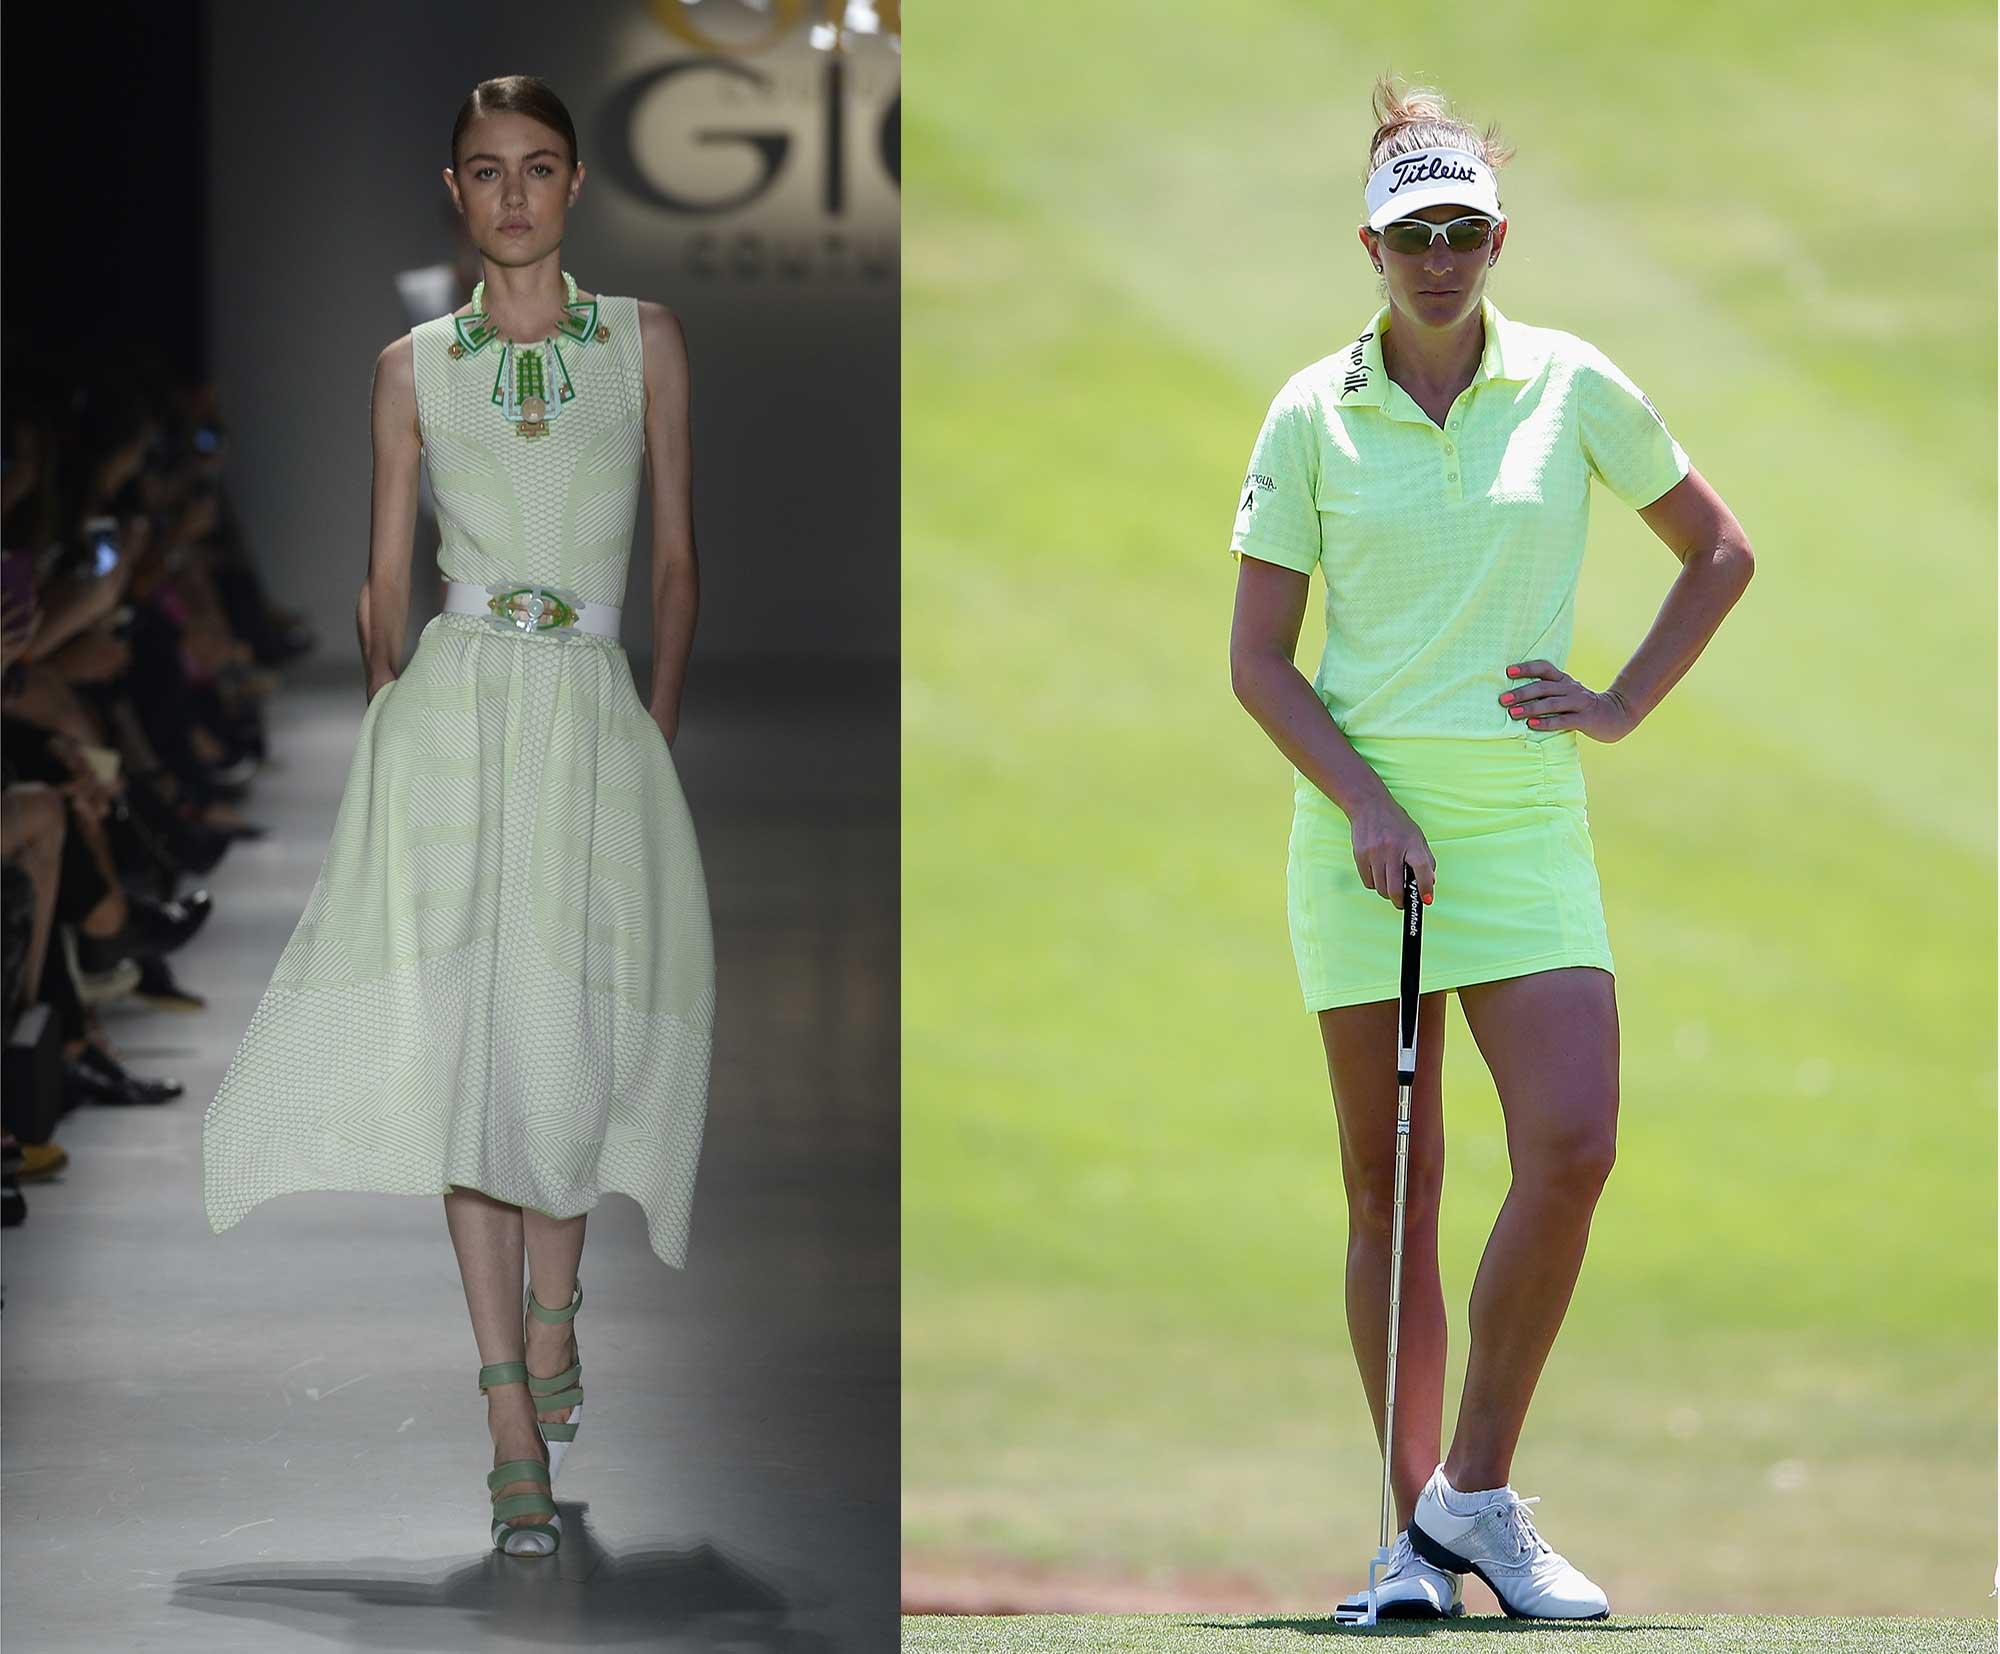 Runways to Fairways: What's Trending on Tour | LPGA | Ladies